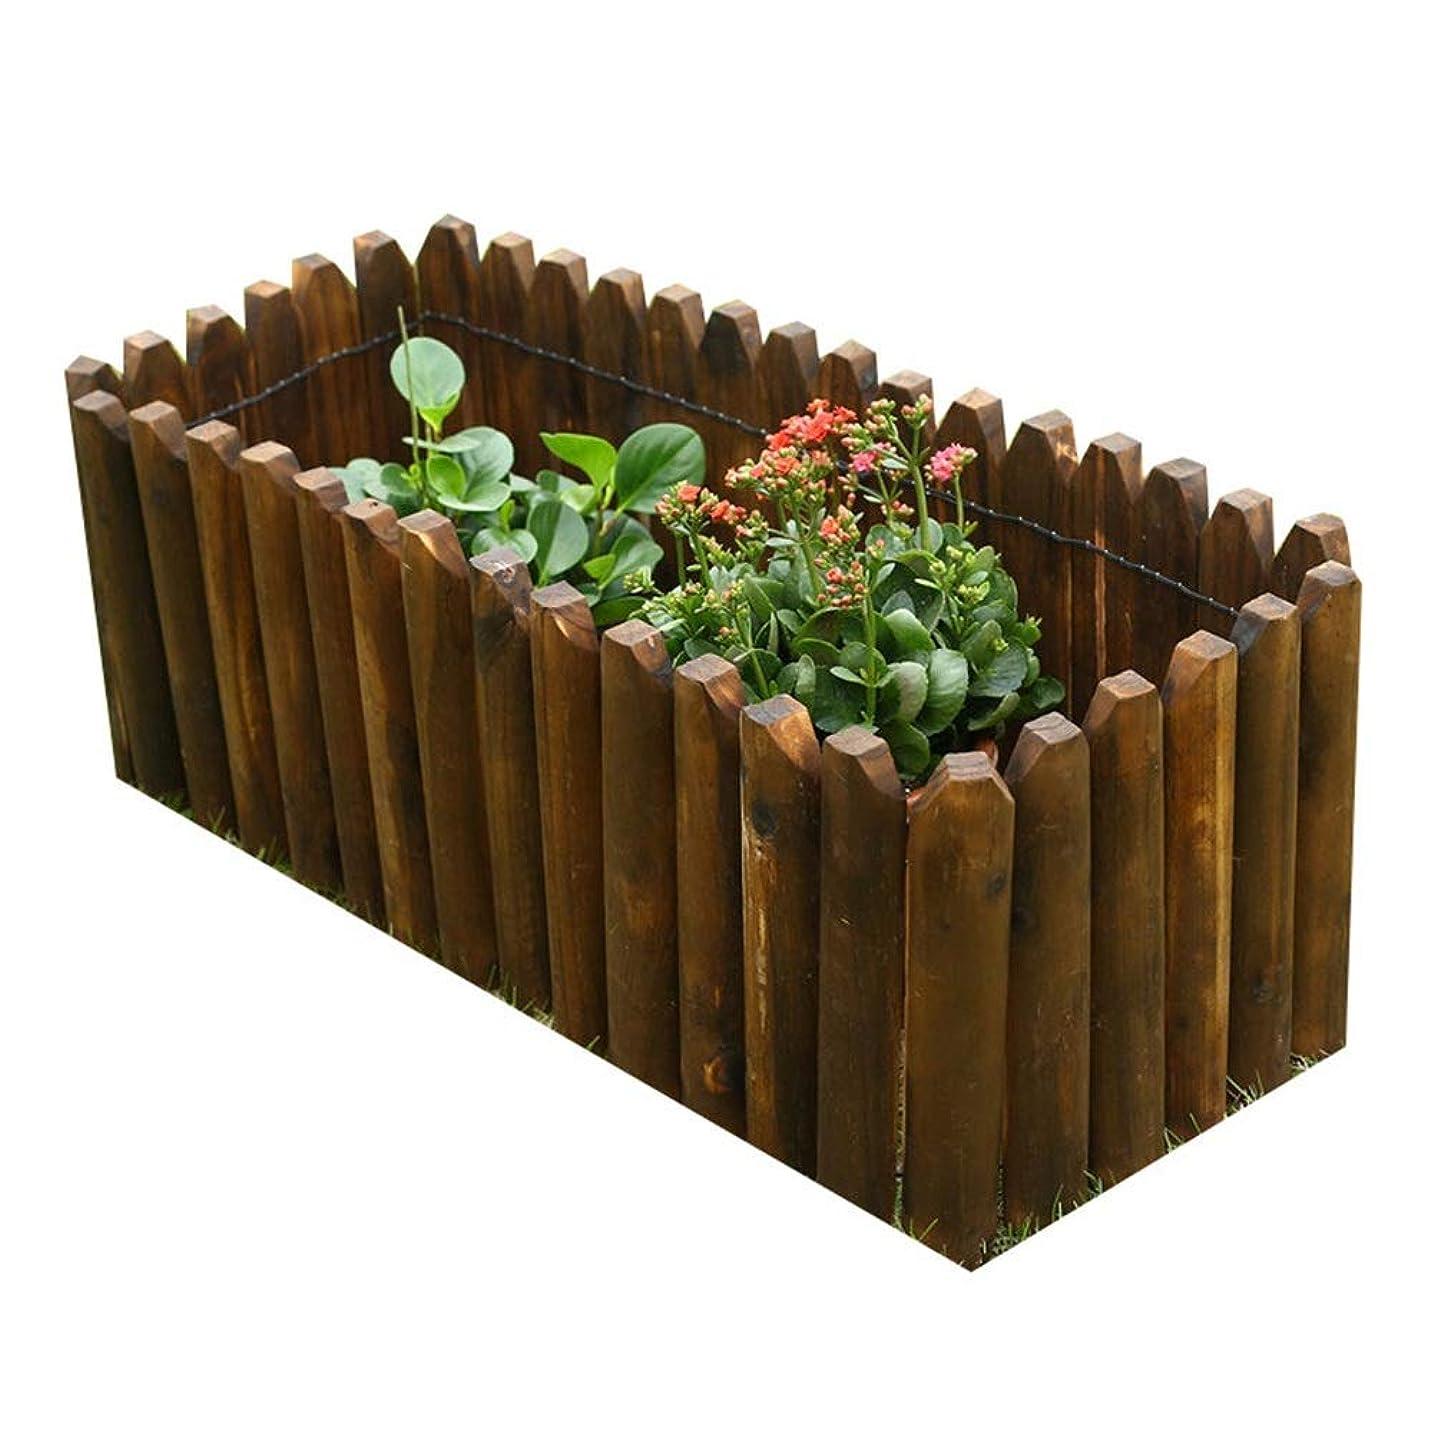 LIXIONG ボーダーフェンス ガーデンフェンス屋外の 木製 連動 パネル 工場 柵 芝生 境界 にとって デコレーション 花 植付、 8サイズ (Size : 120x50cm)